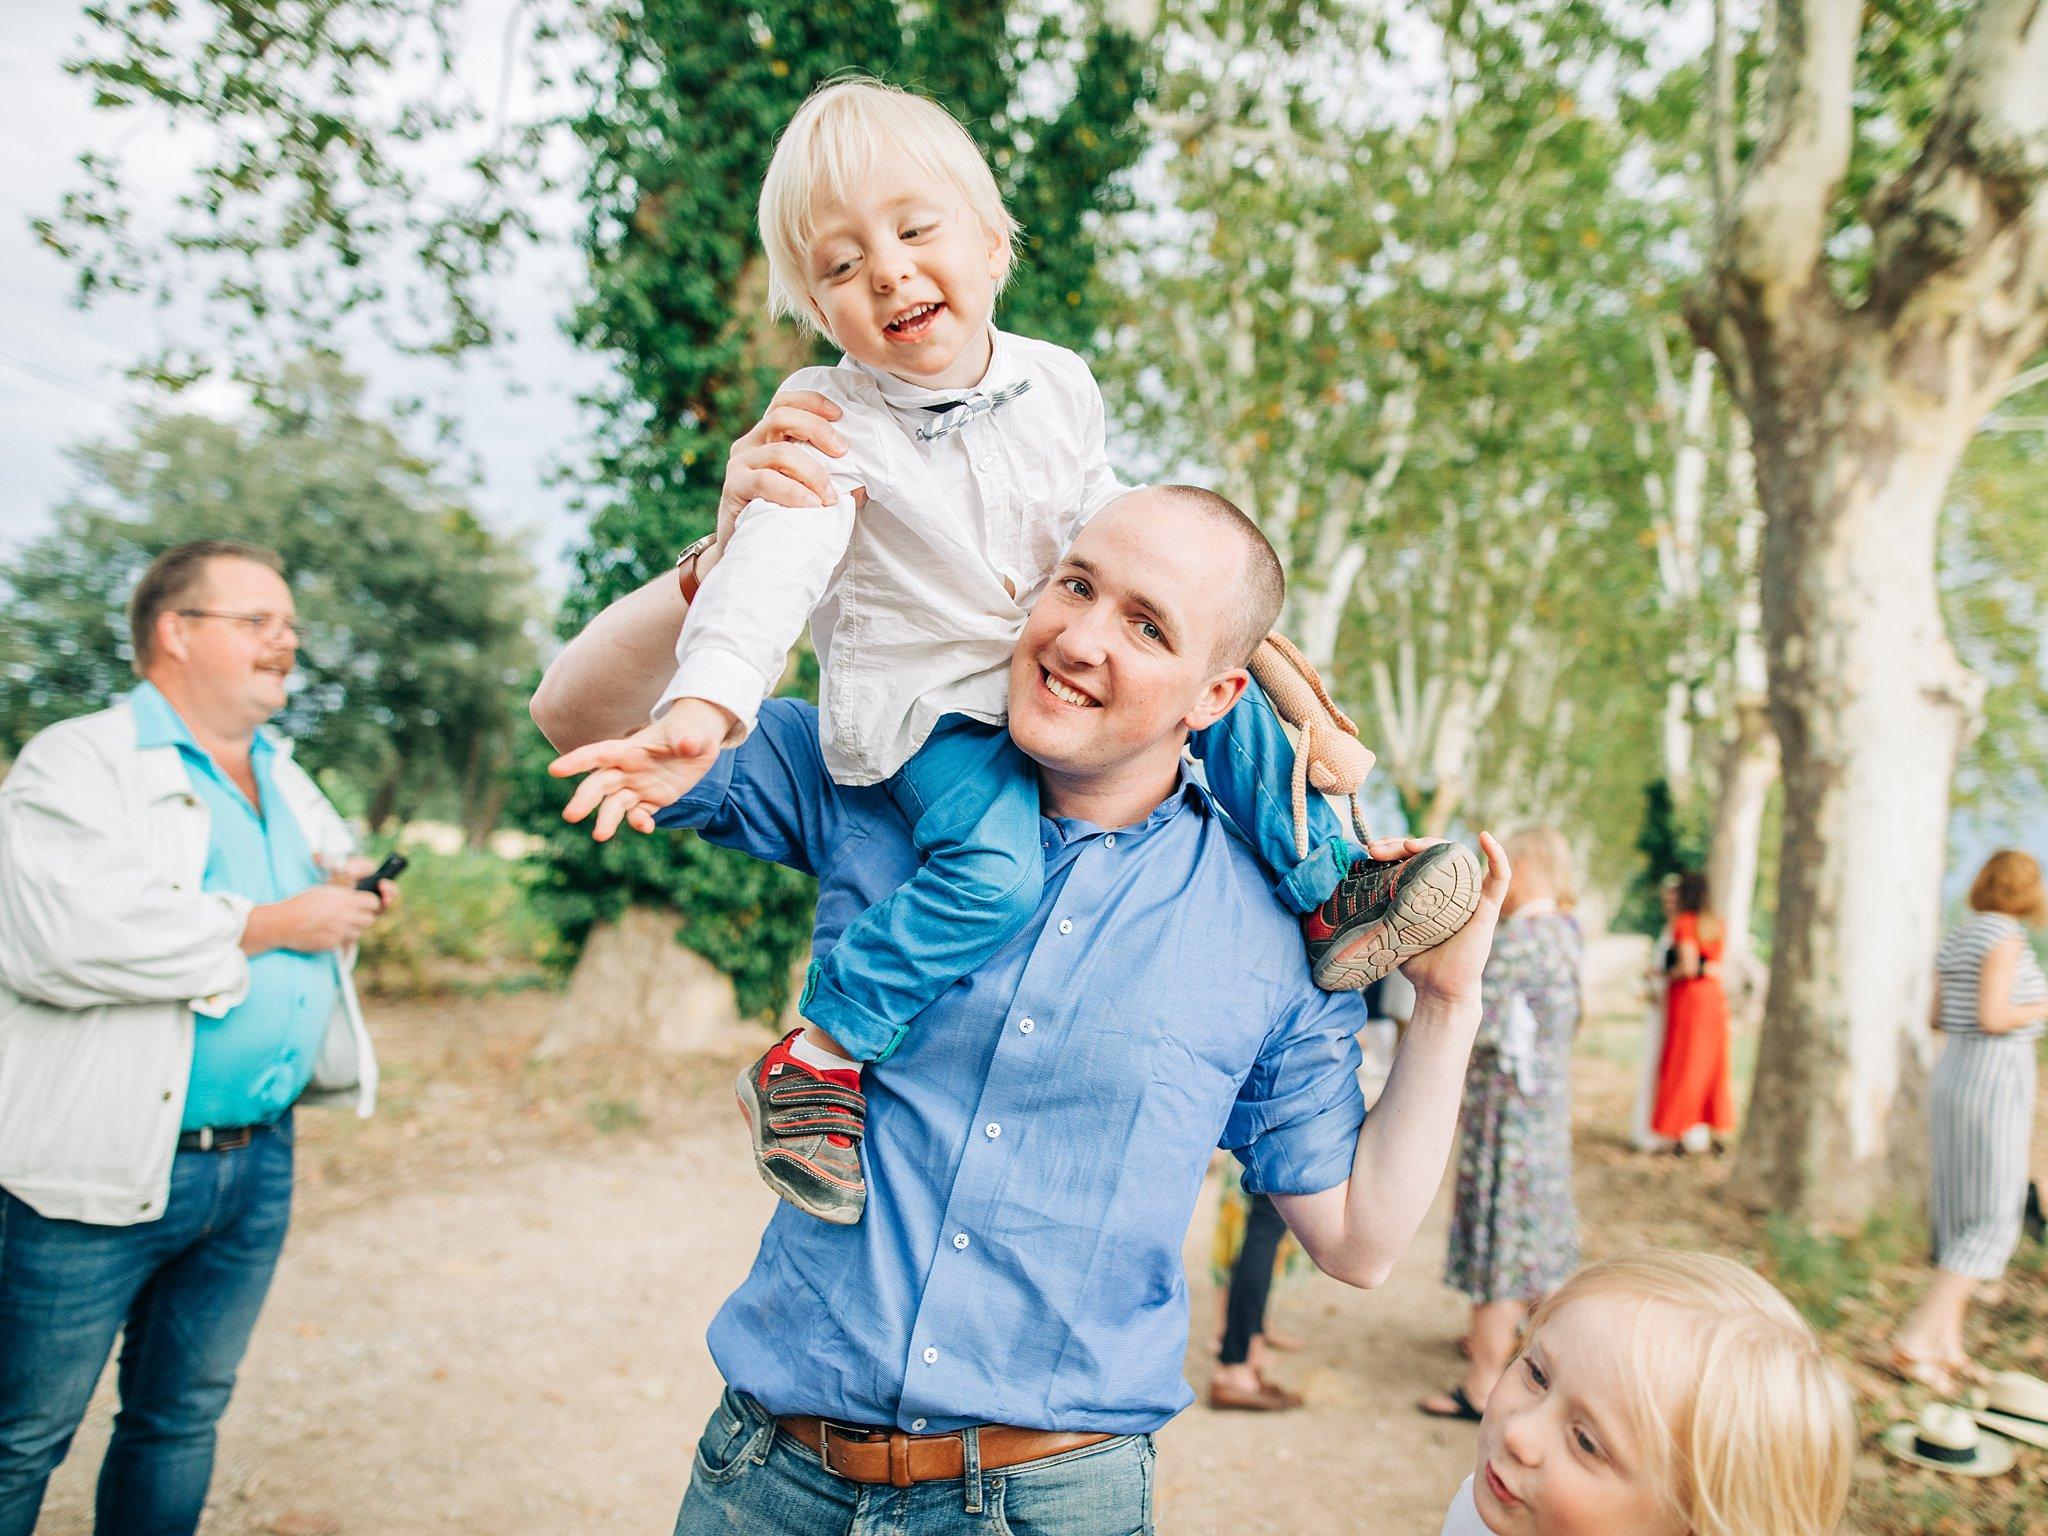 Wedding Photographer Perpignan - Château Las Collas Wedding - Hugo Hennequin082.jpg